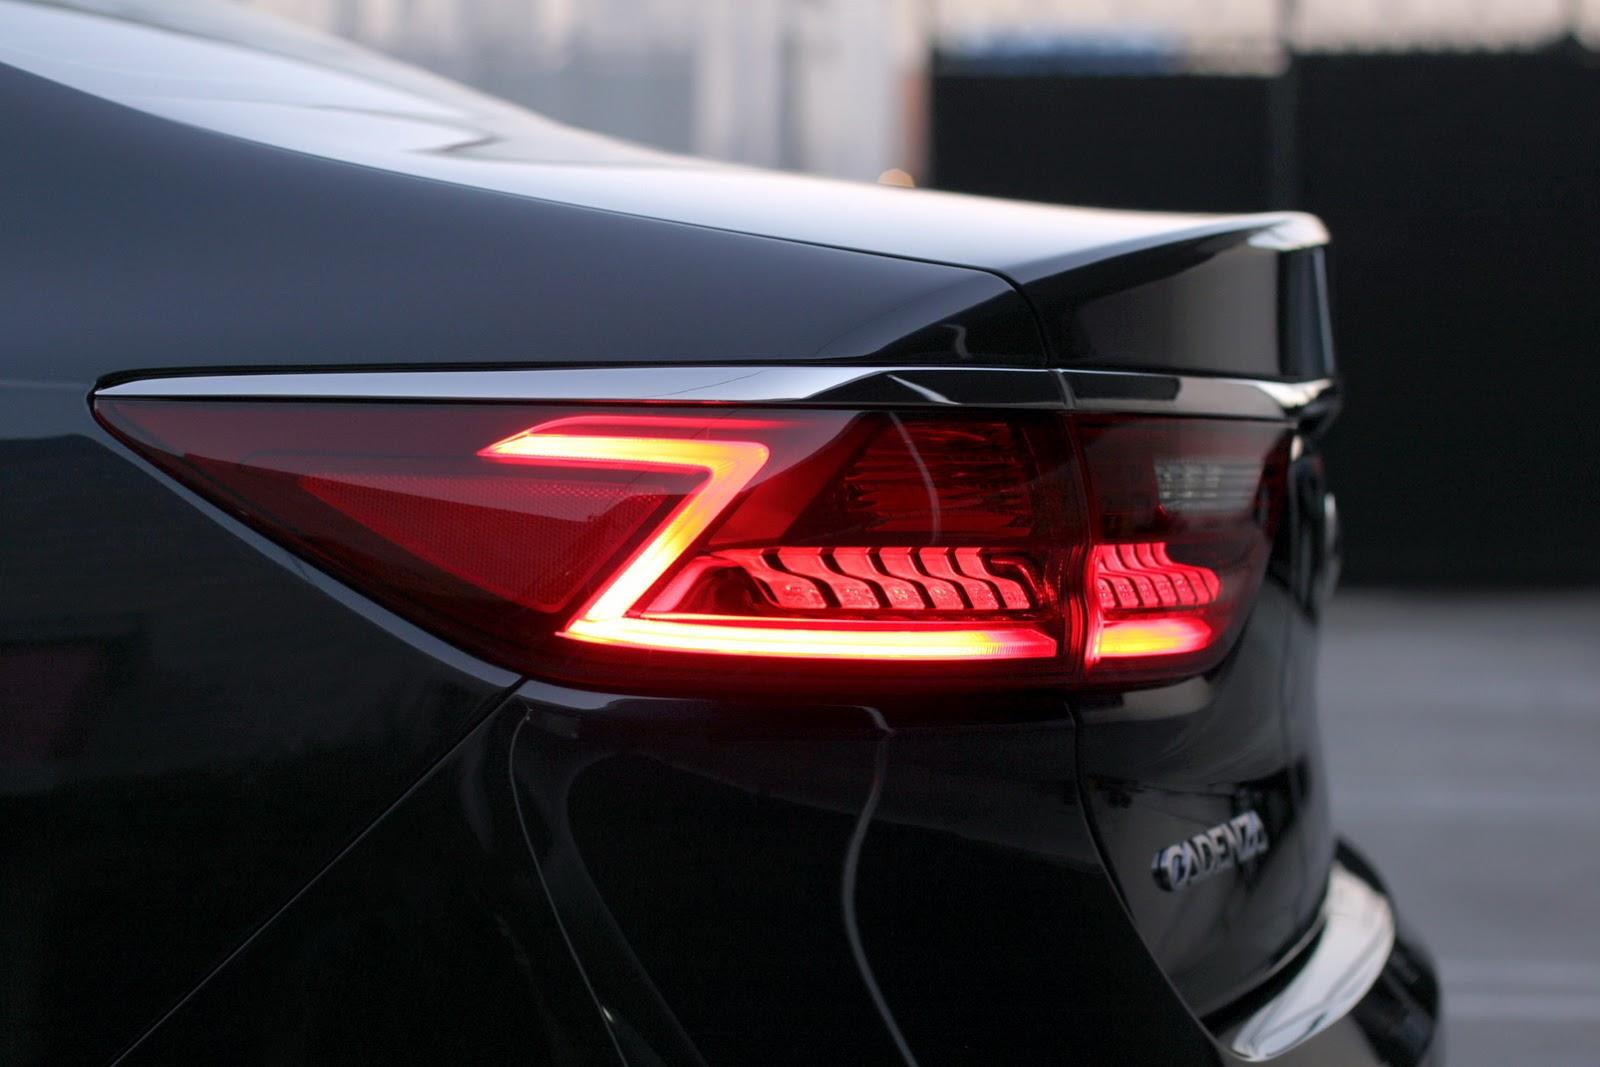 Đánh giá xe Kia Cadenza 2017